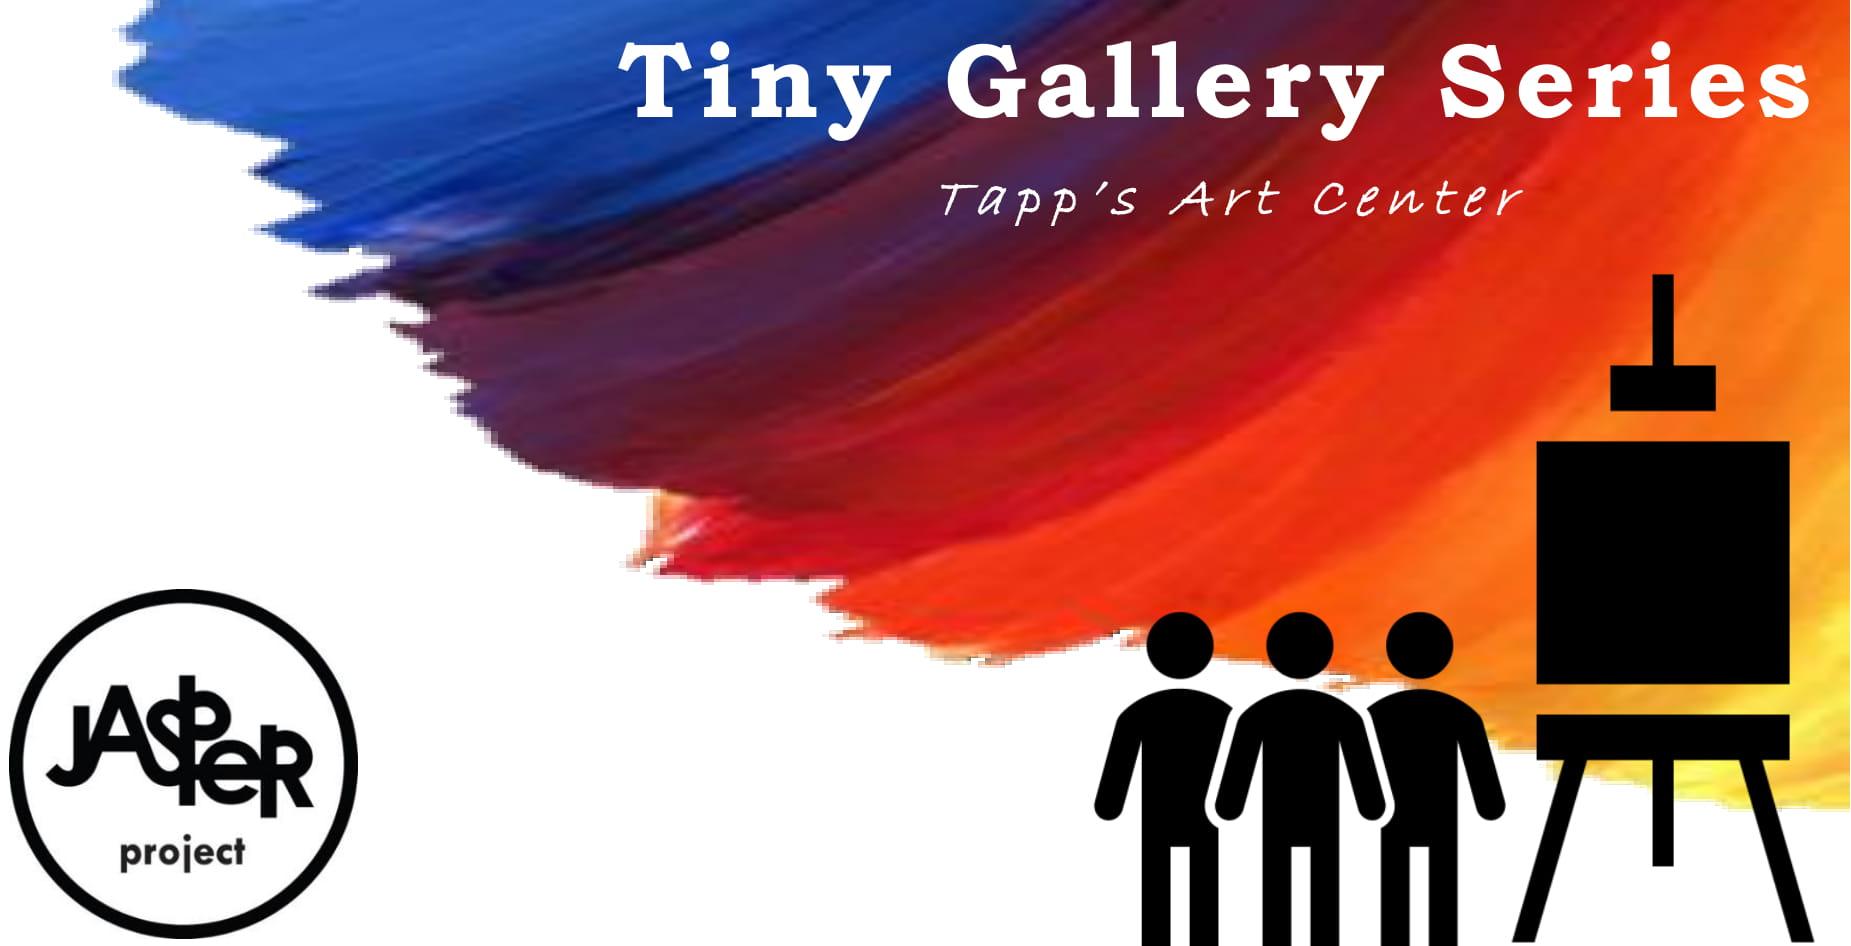 Tiny Gallery Series Graphic 1 JPG.jpg